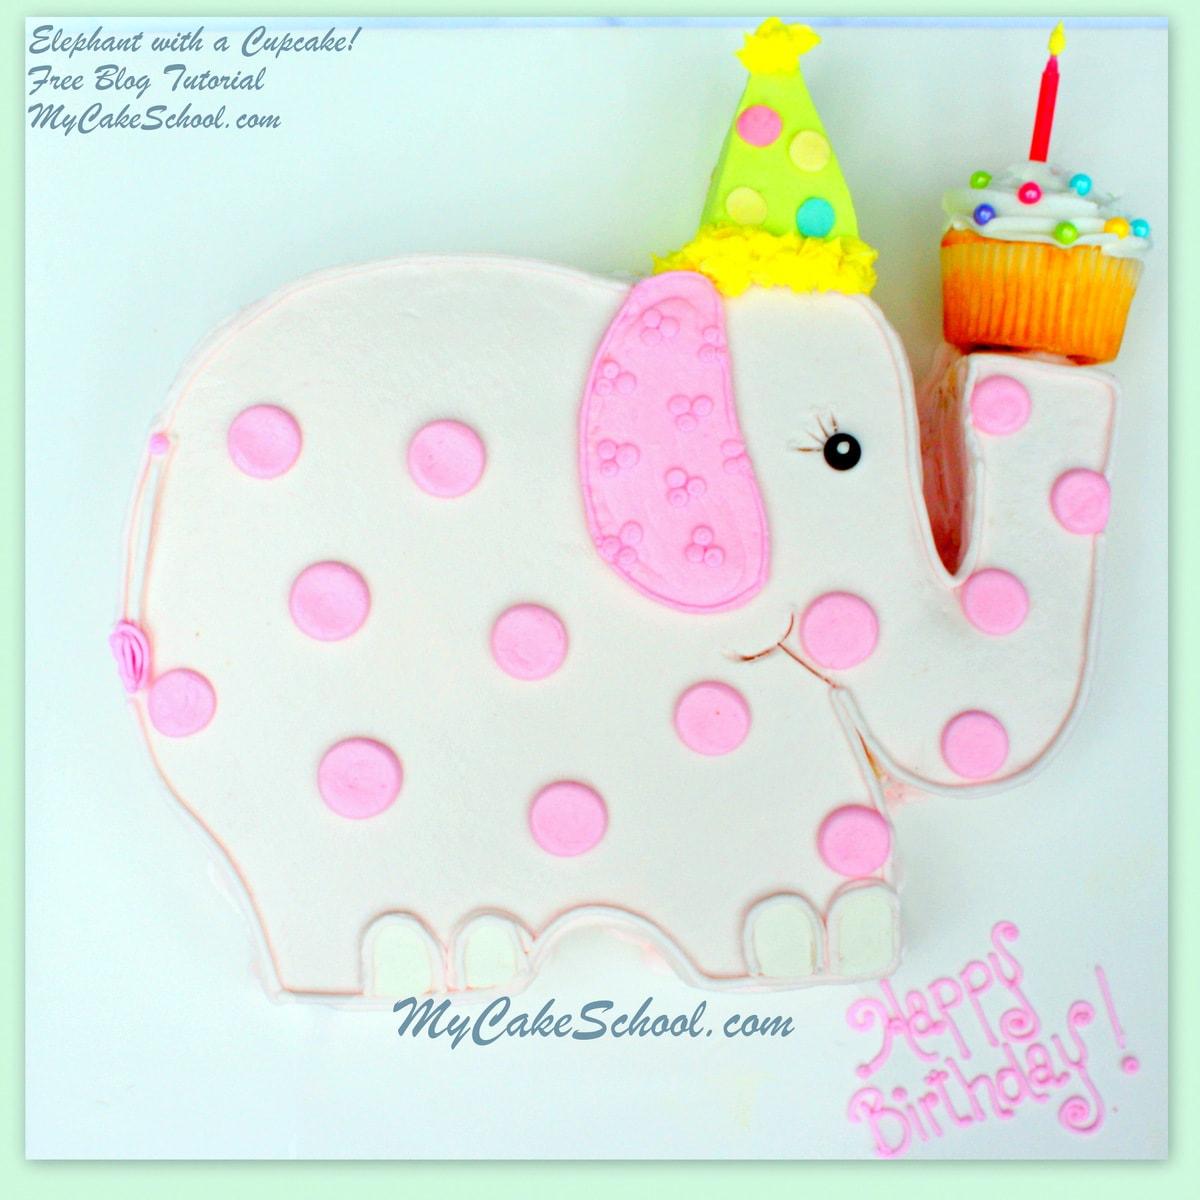 CUTE Elephant with a Cupcake Tutorial by MyCakeSchool.com! Free step by step Elephant Cake Tutorial!